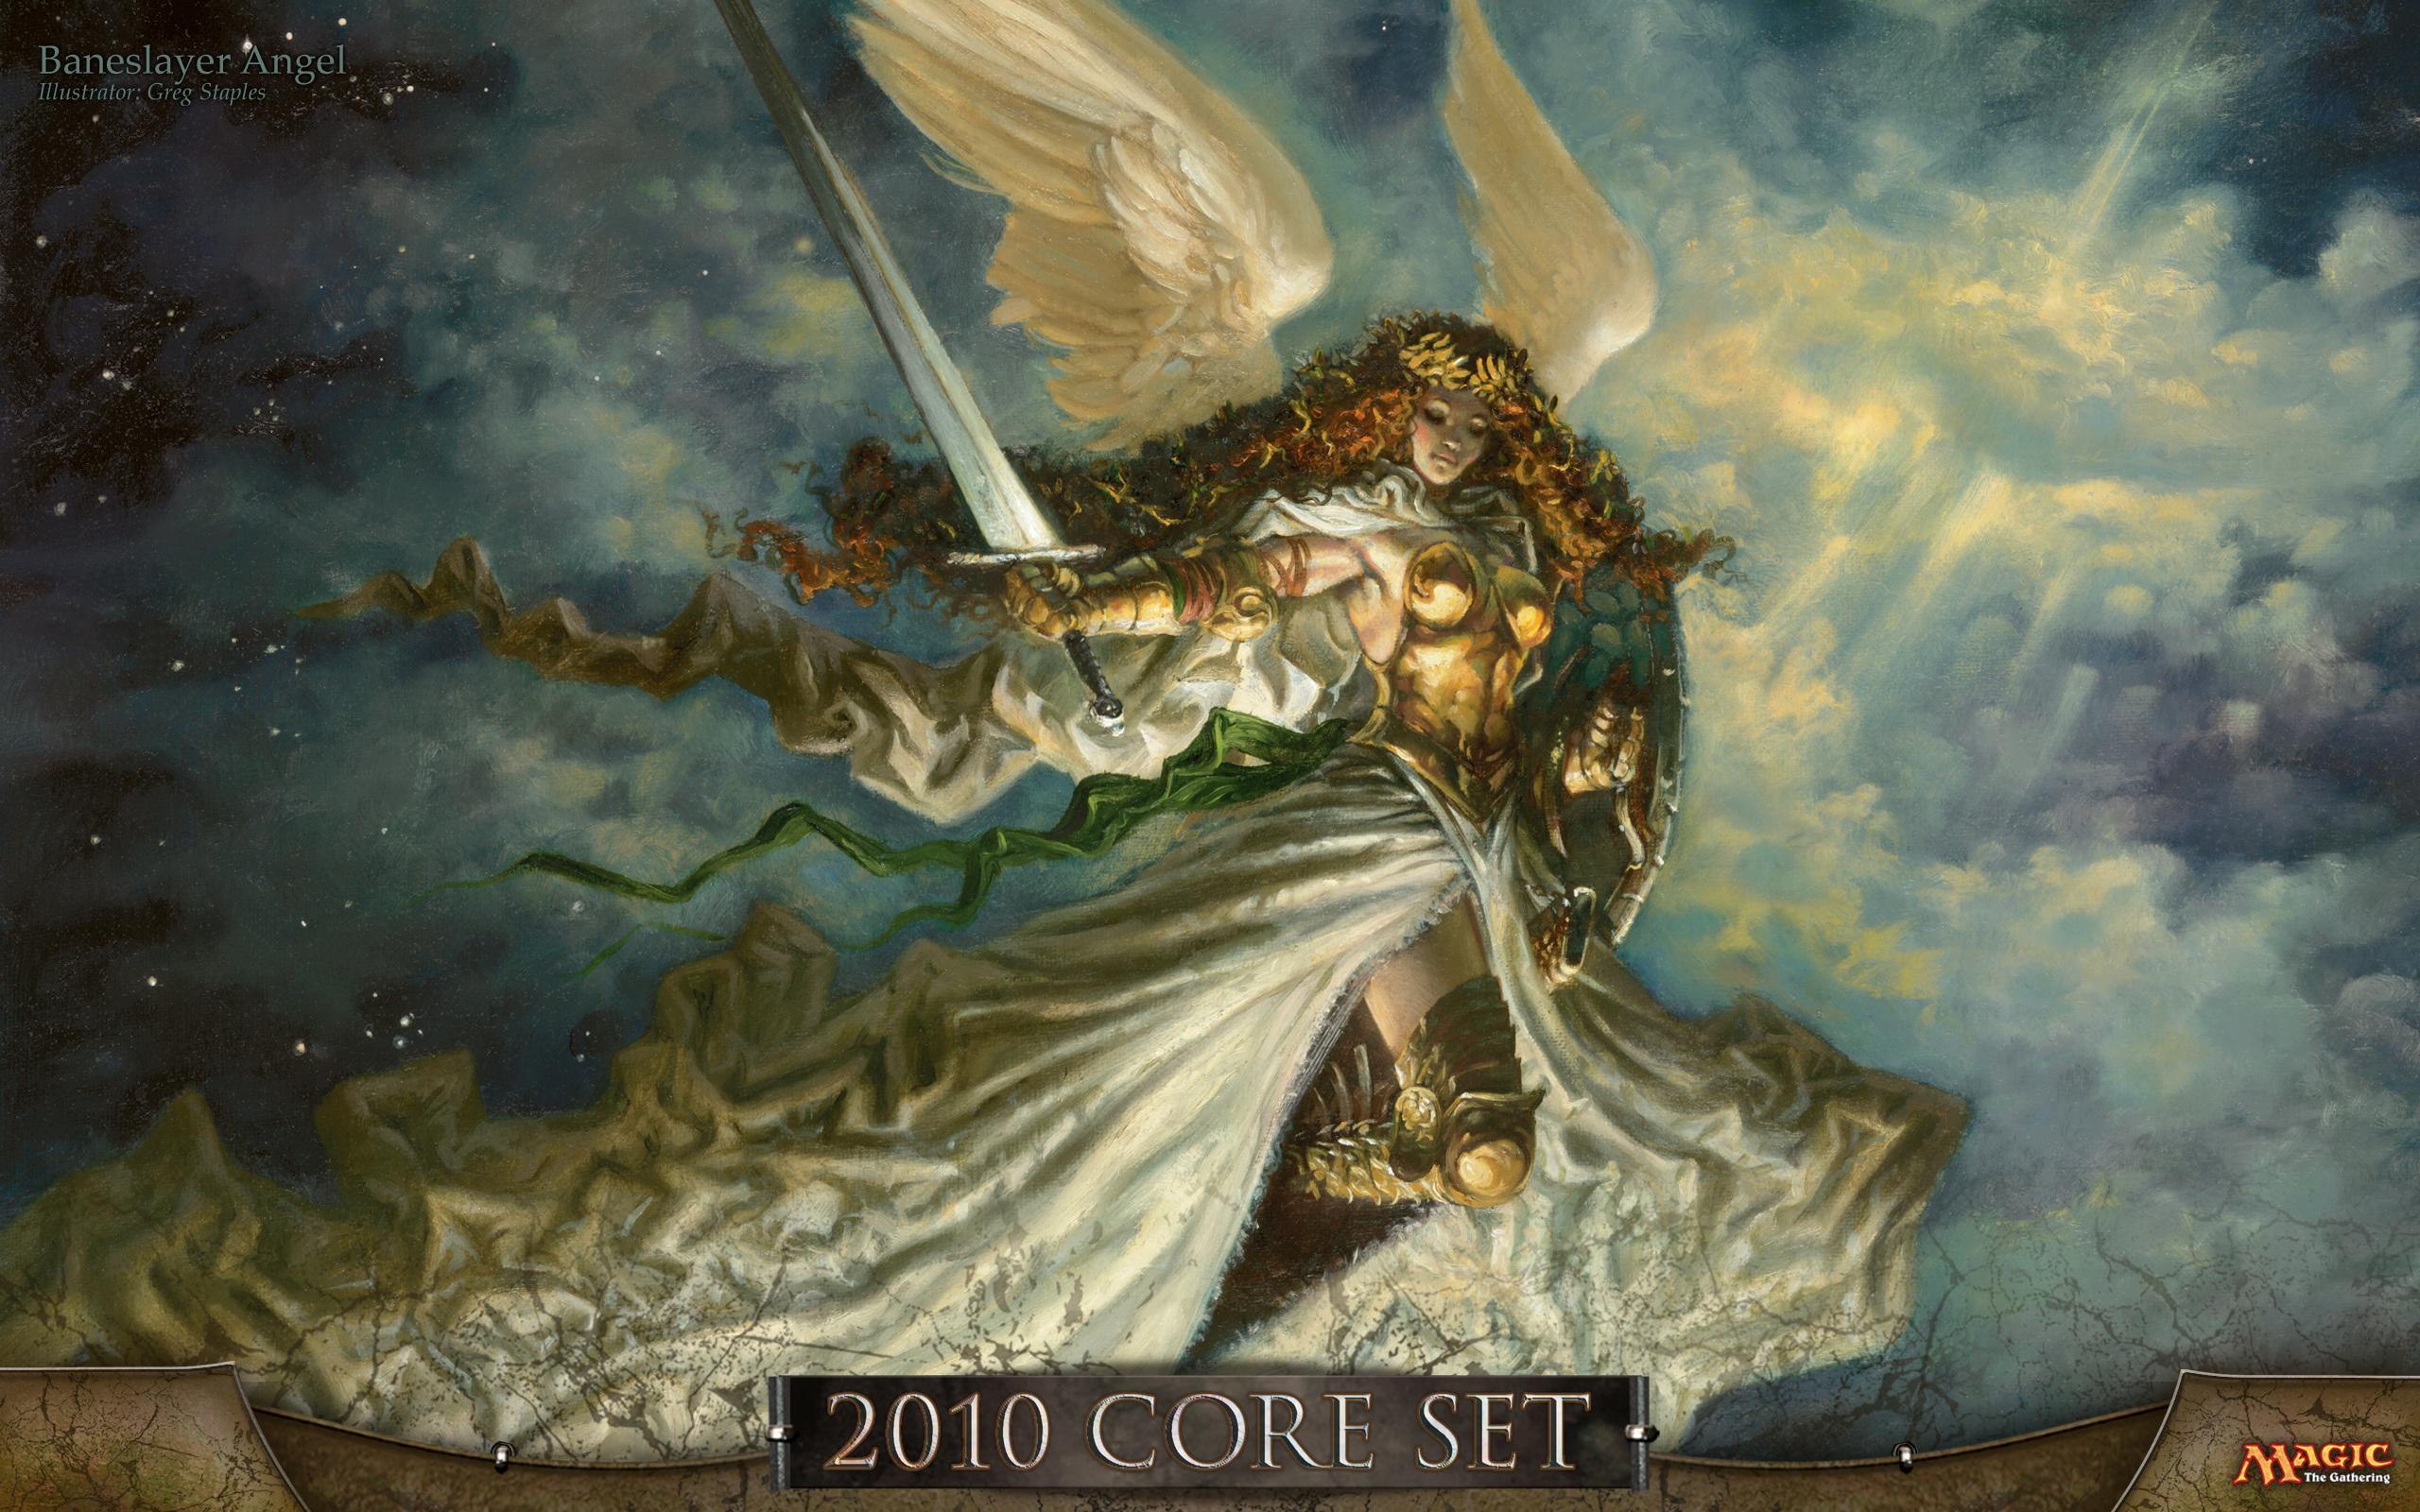 Baneslayer Angel | Illustration by Greg Staples